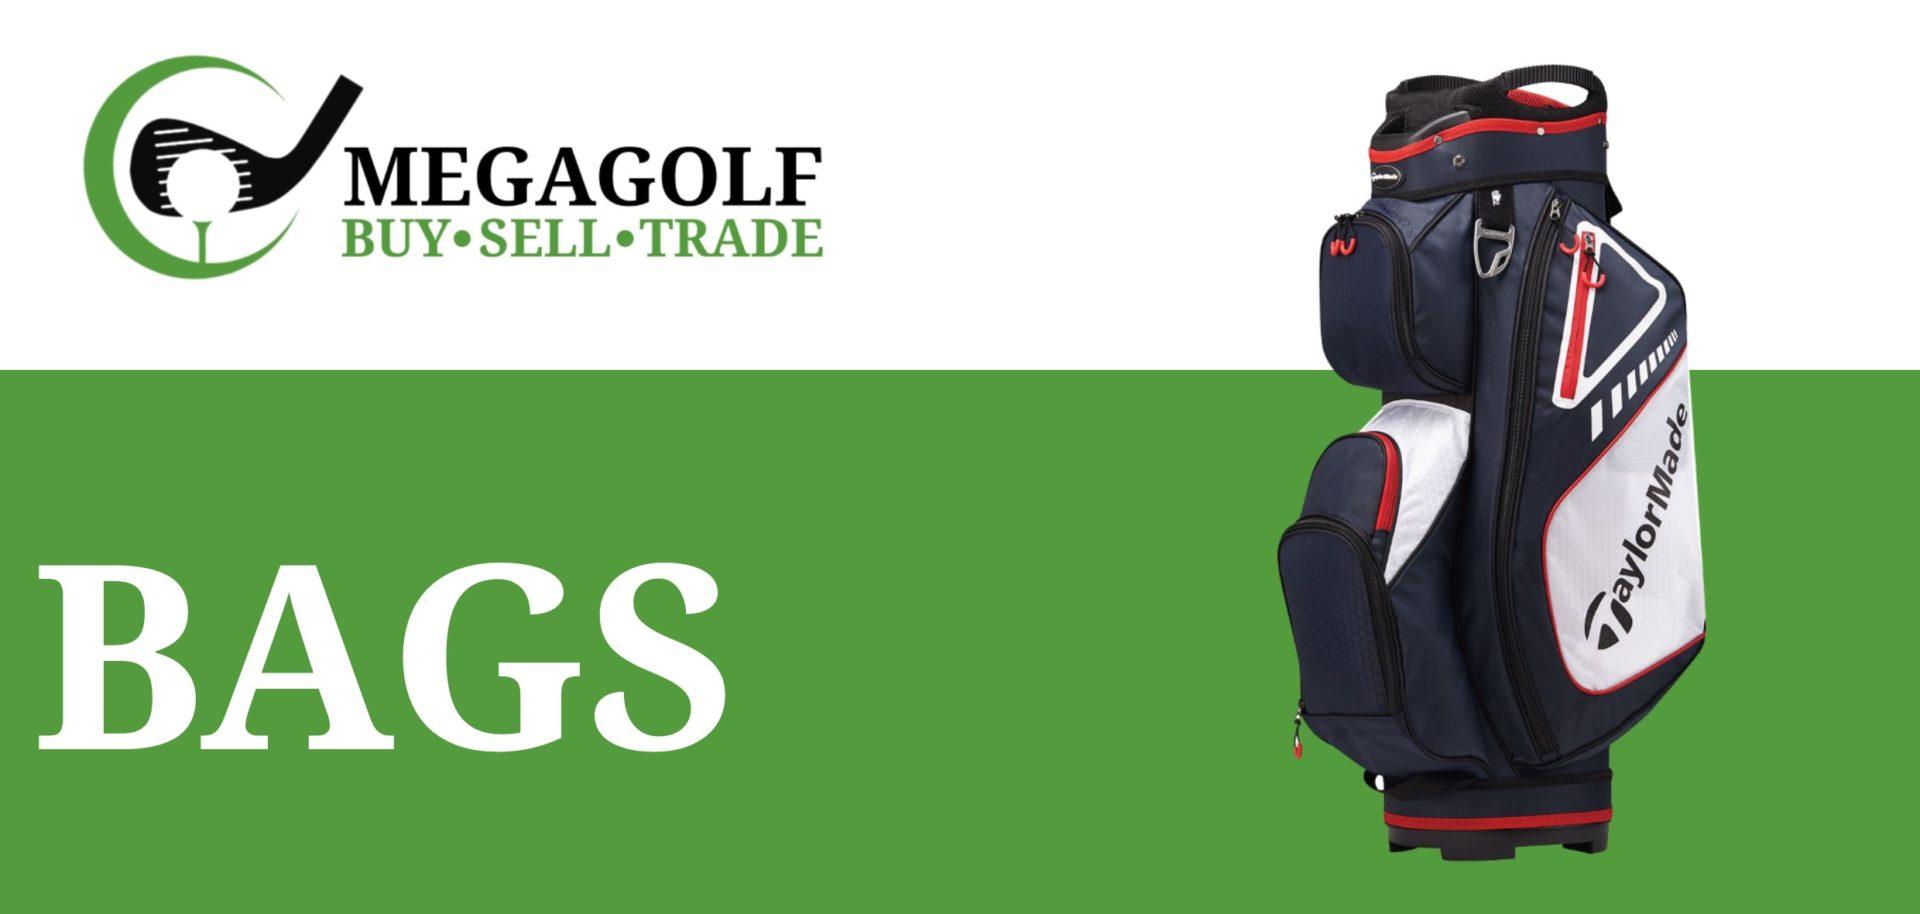 USED BAGS UK